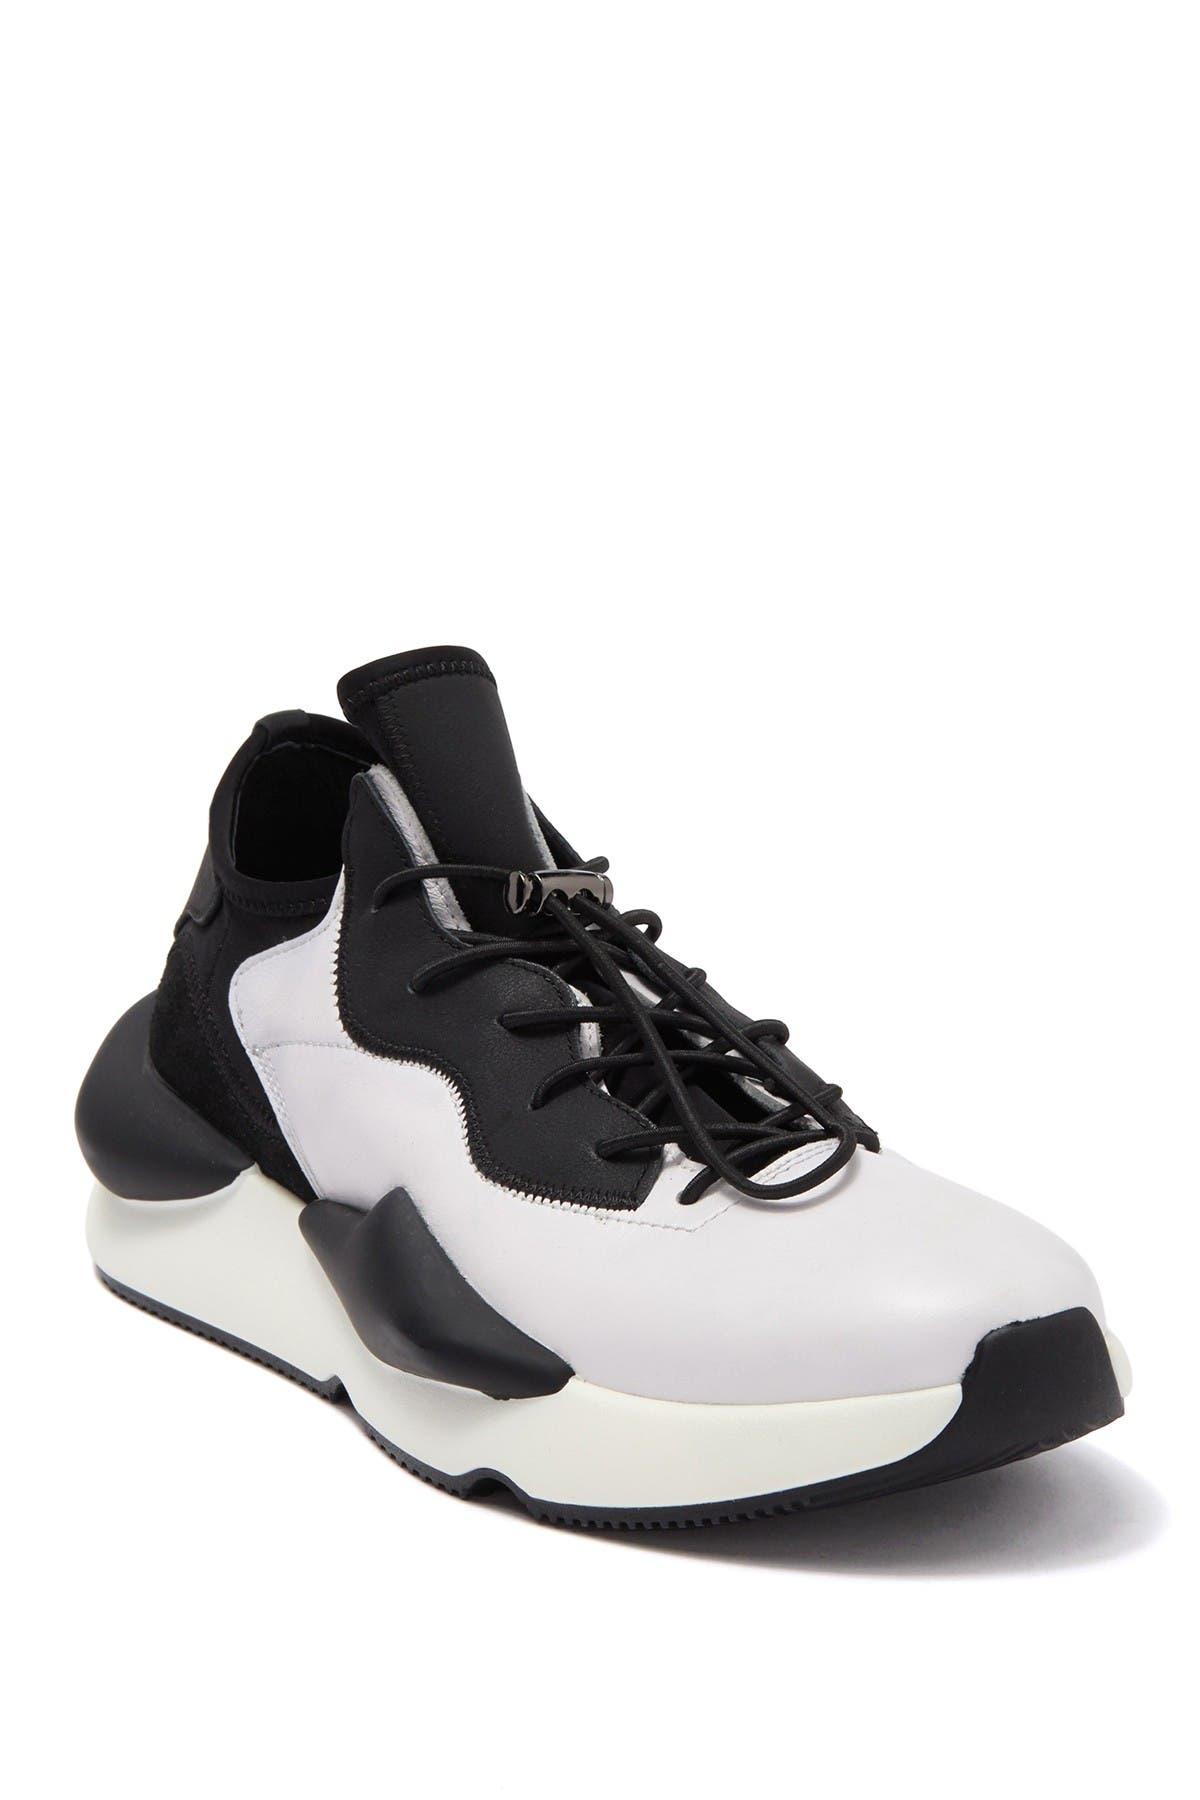 Image of Karl Lagerfeld Paris Leather & Neoprene Chunky Platform Sneaker